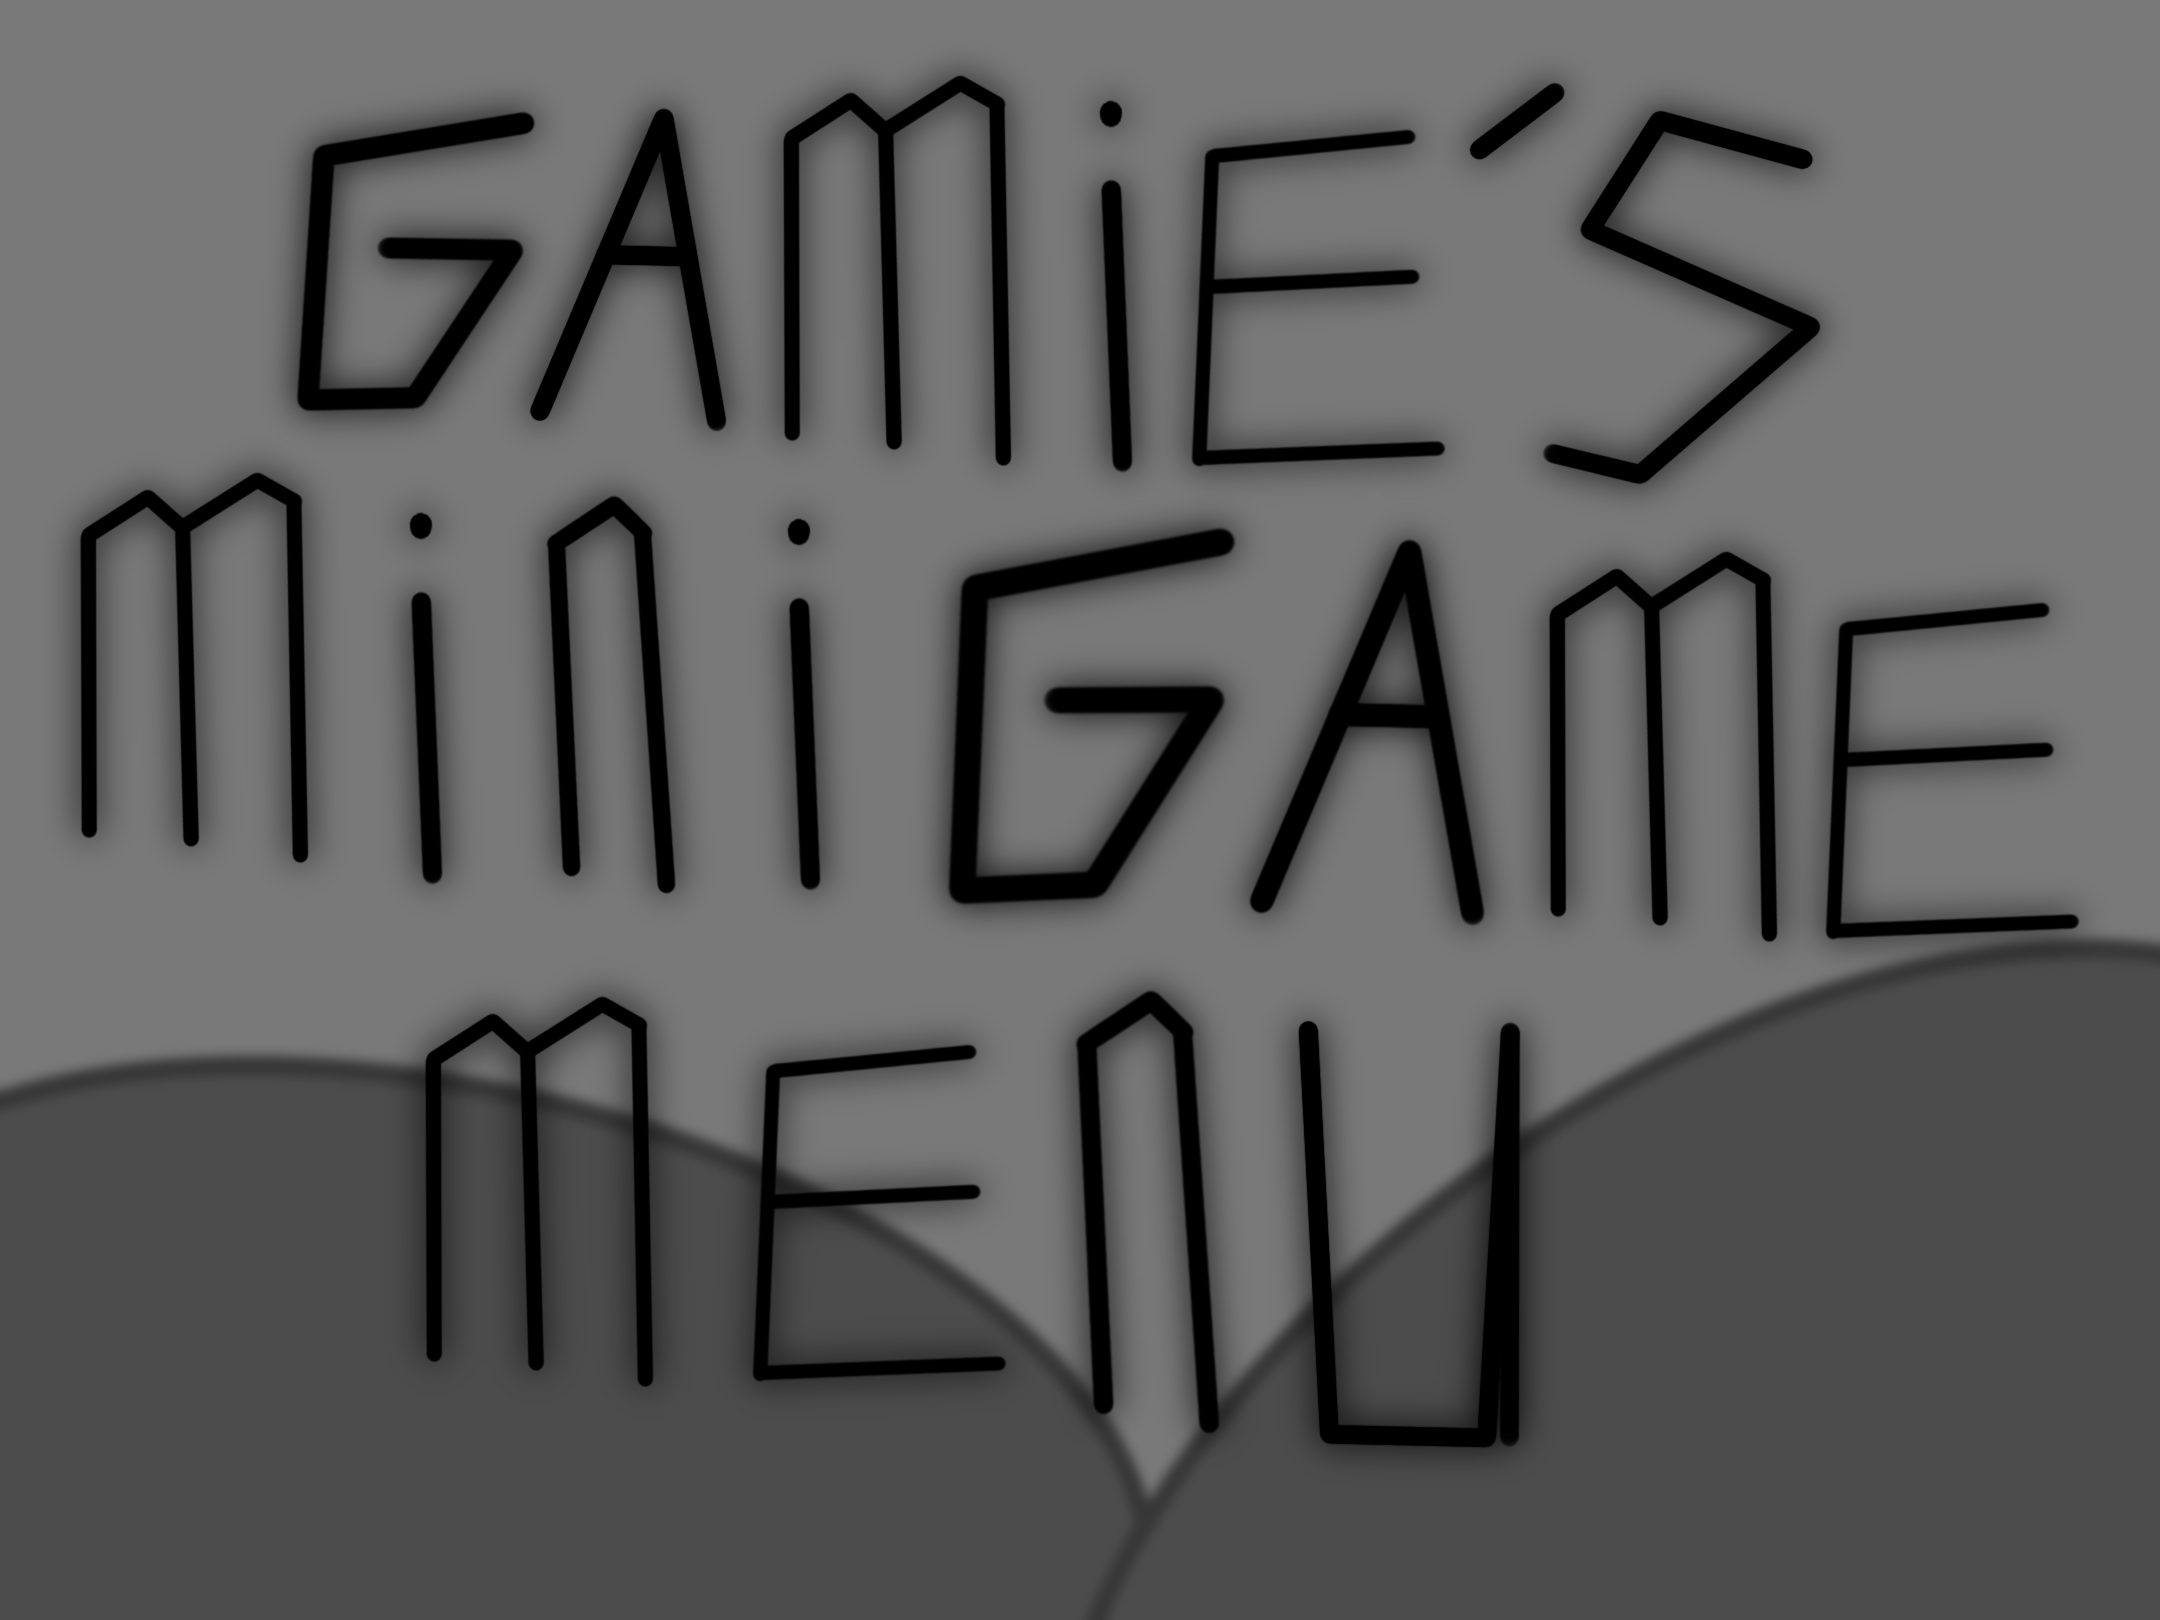 Gamie's Minigame Menu